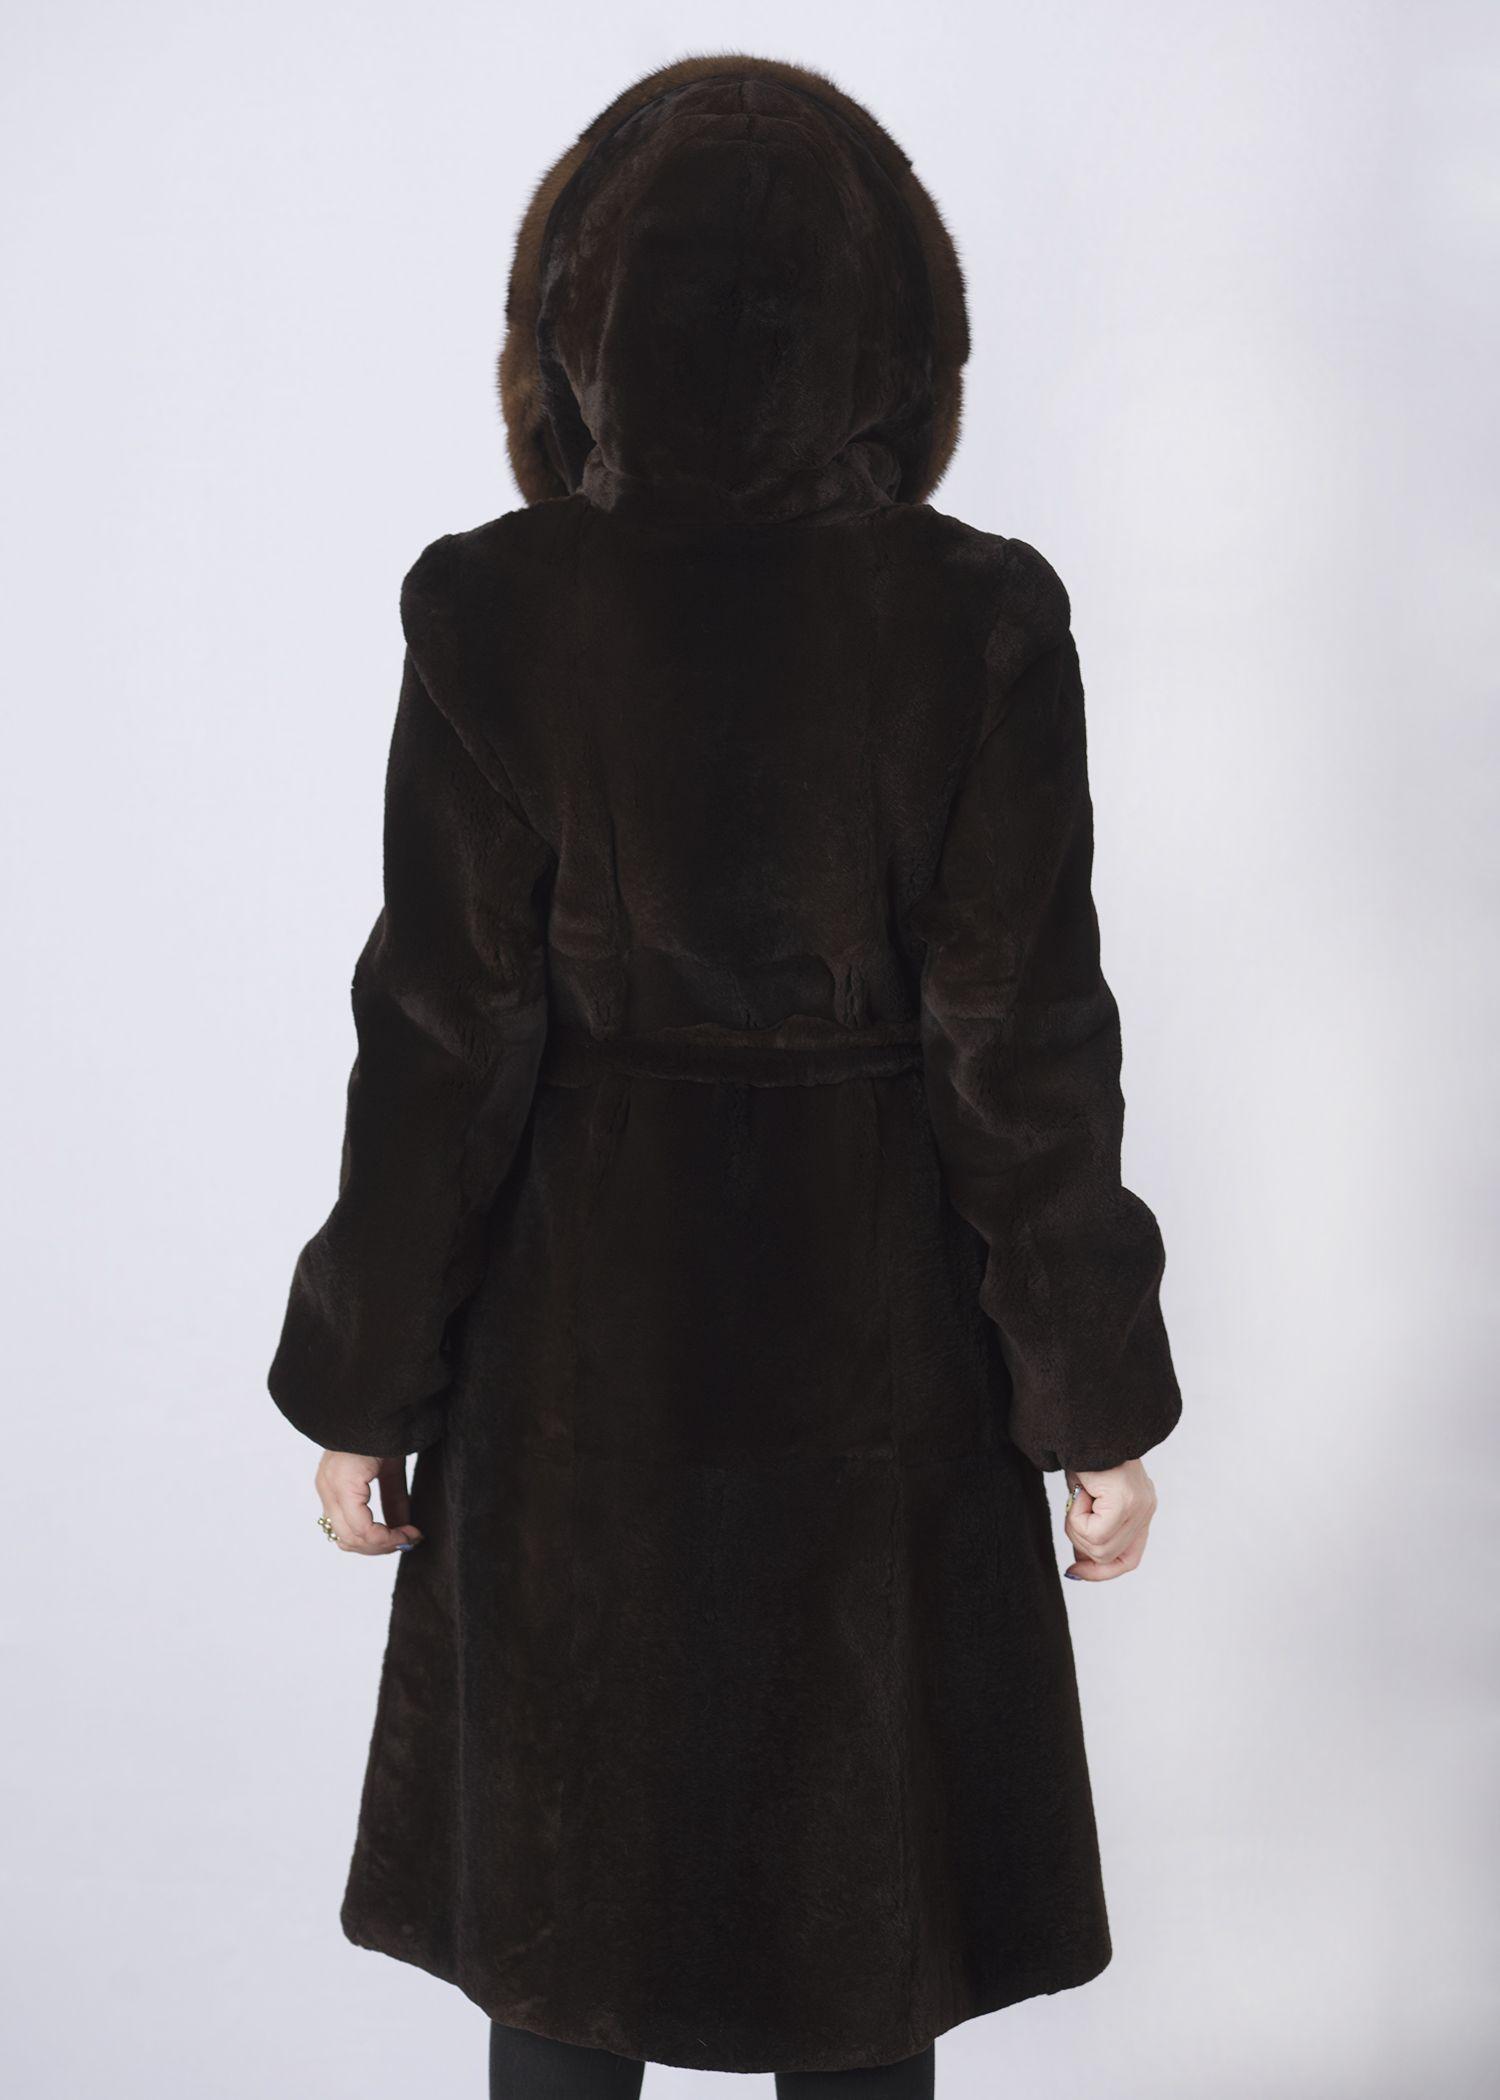 Шуба женская из бобрика(rex) 1228 фото №1